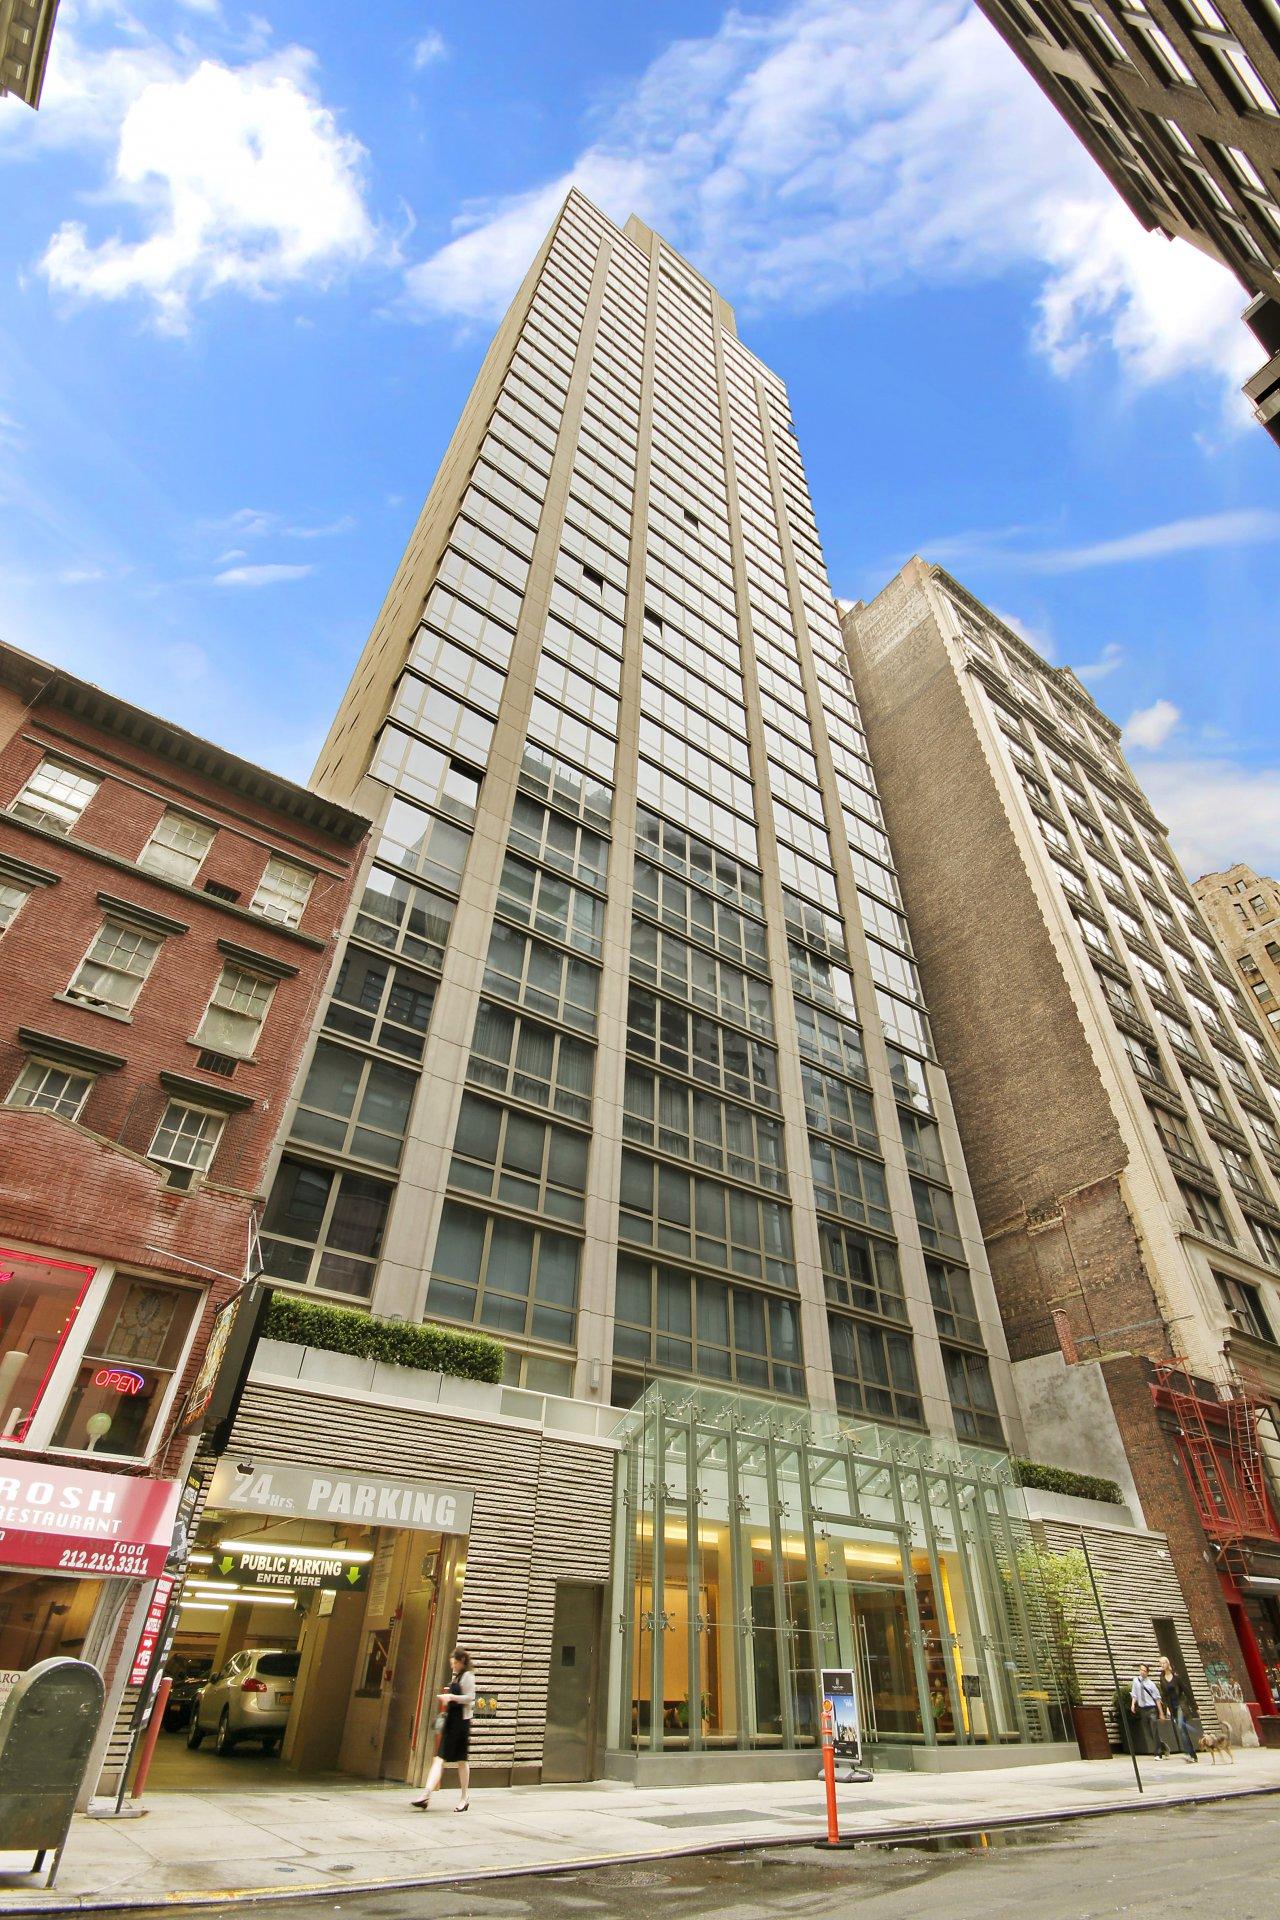 Ad Sale Apartment New York (10016) ref:5738534